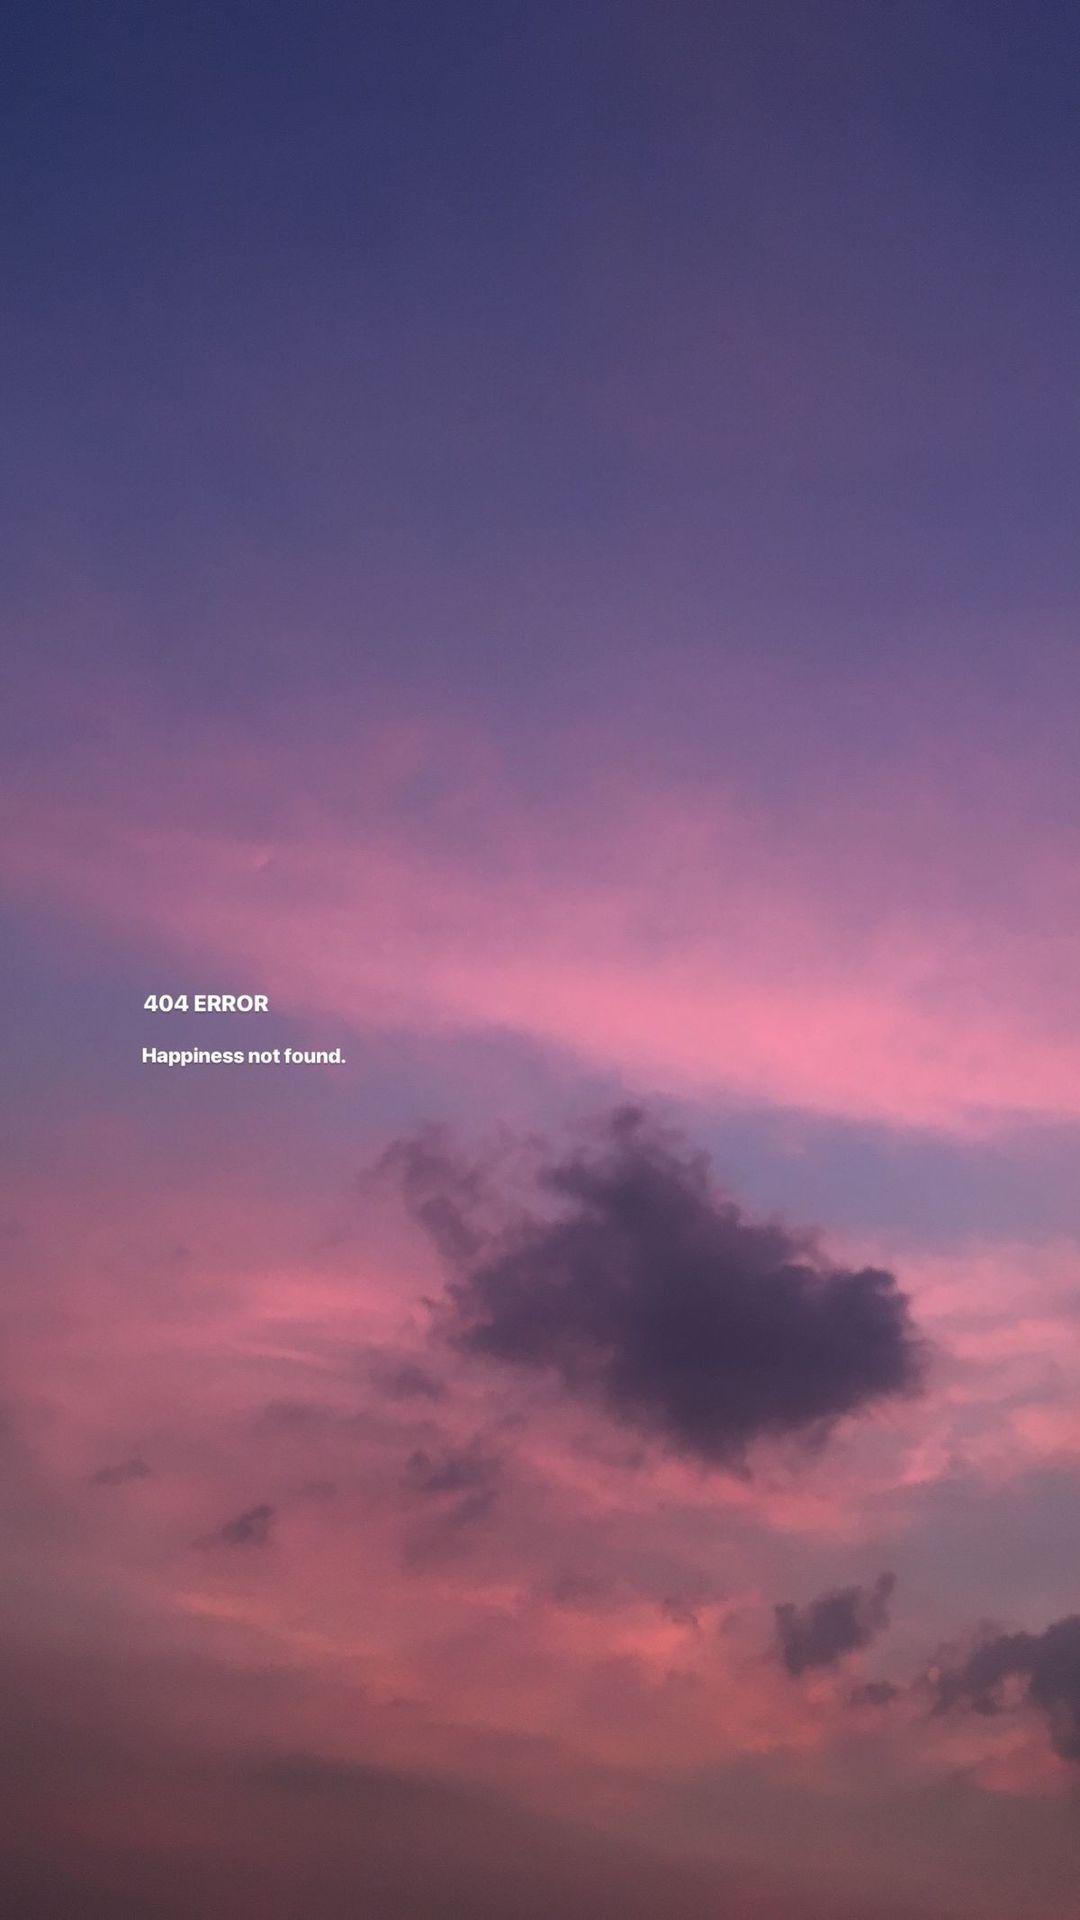 Moonlight/aesthetic book